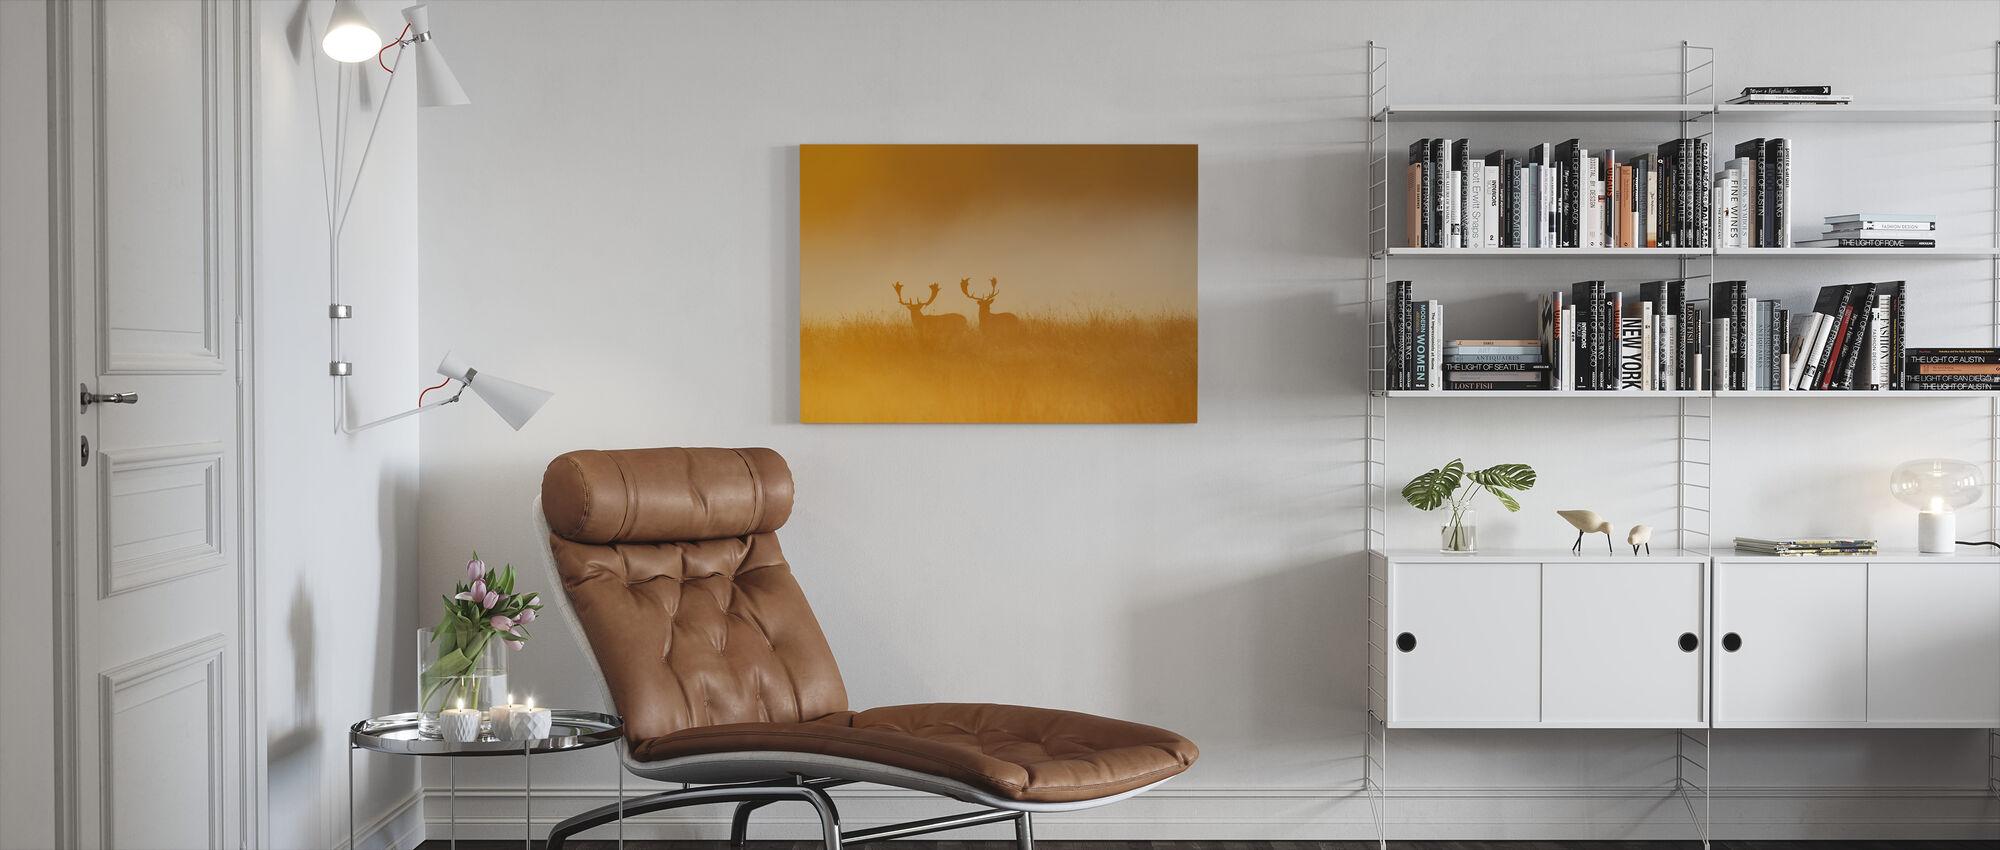 Deer in Yellow Light - Canvas print - Living Room